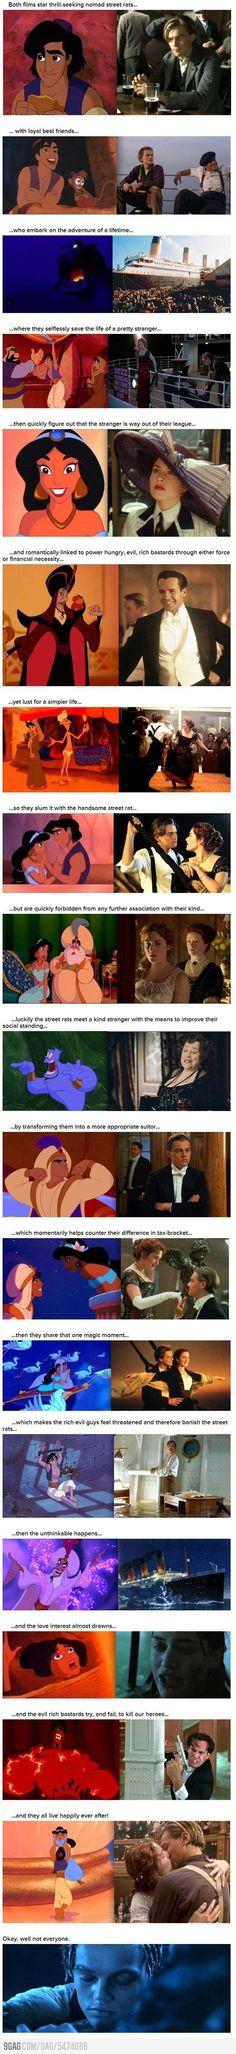 Aladdin vs. Titanic Haha omg read the whole thing